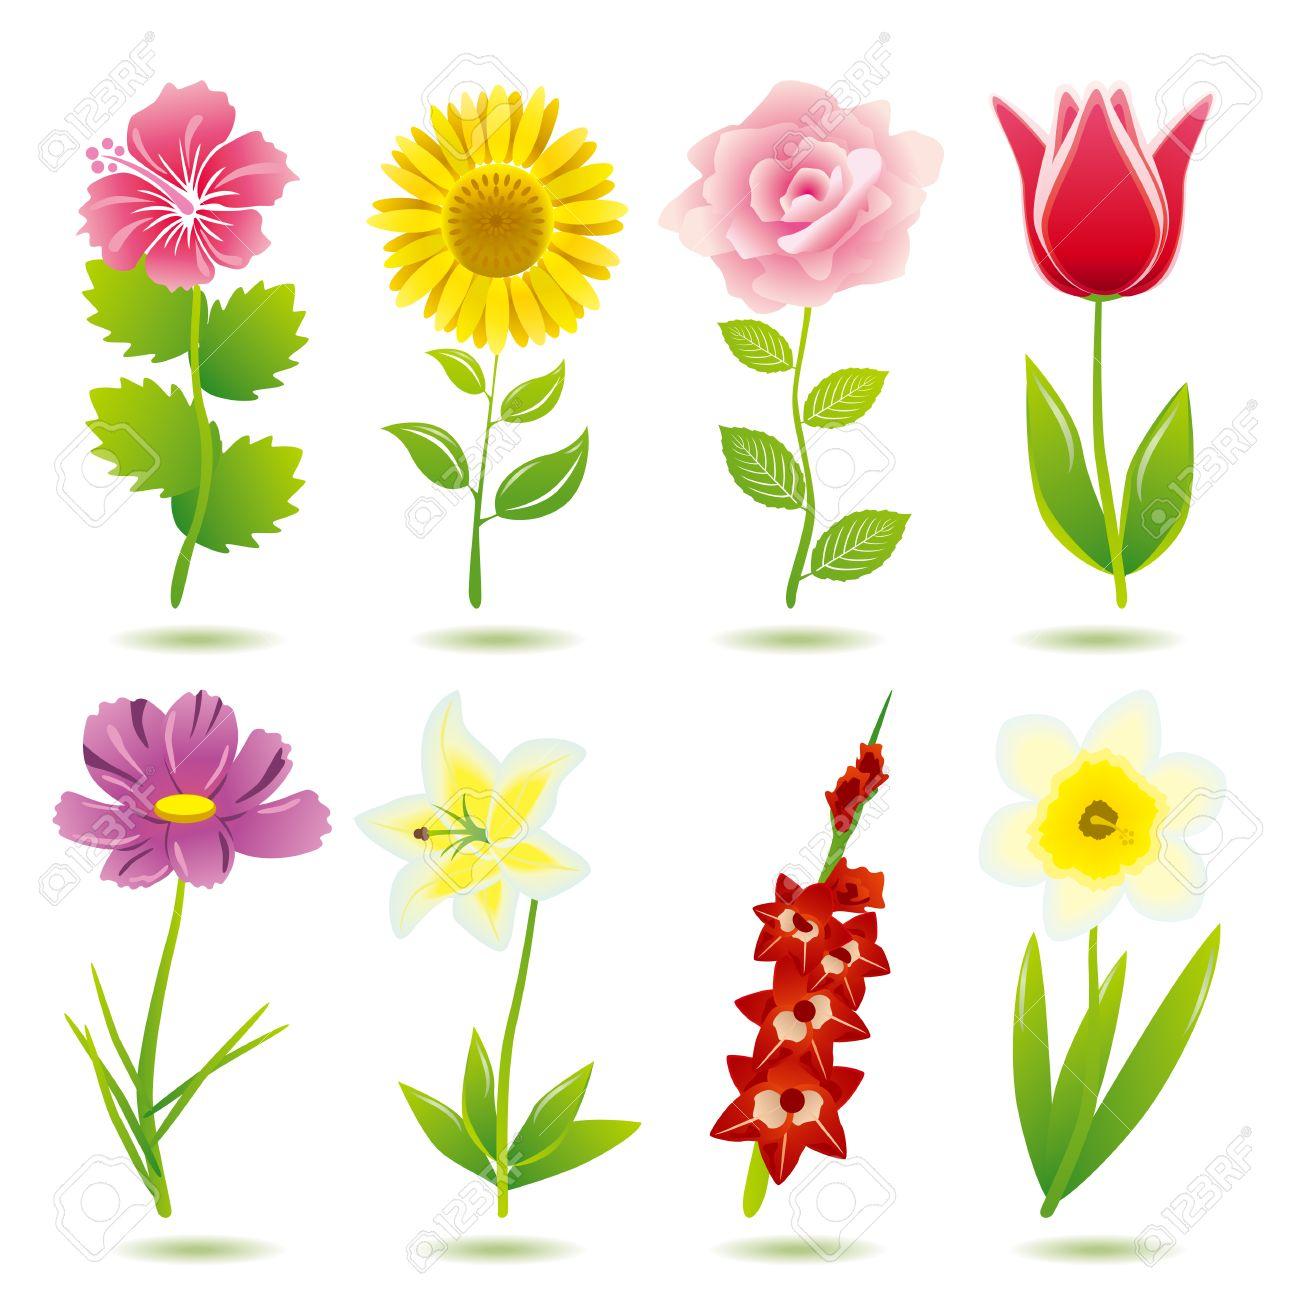 8 flower icons set.